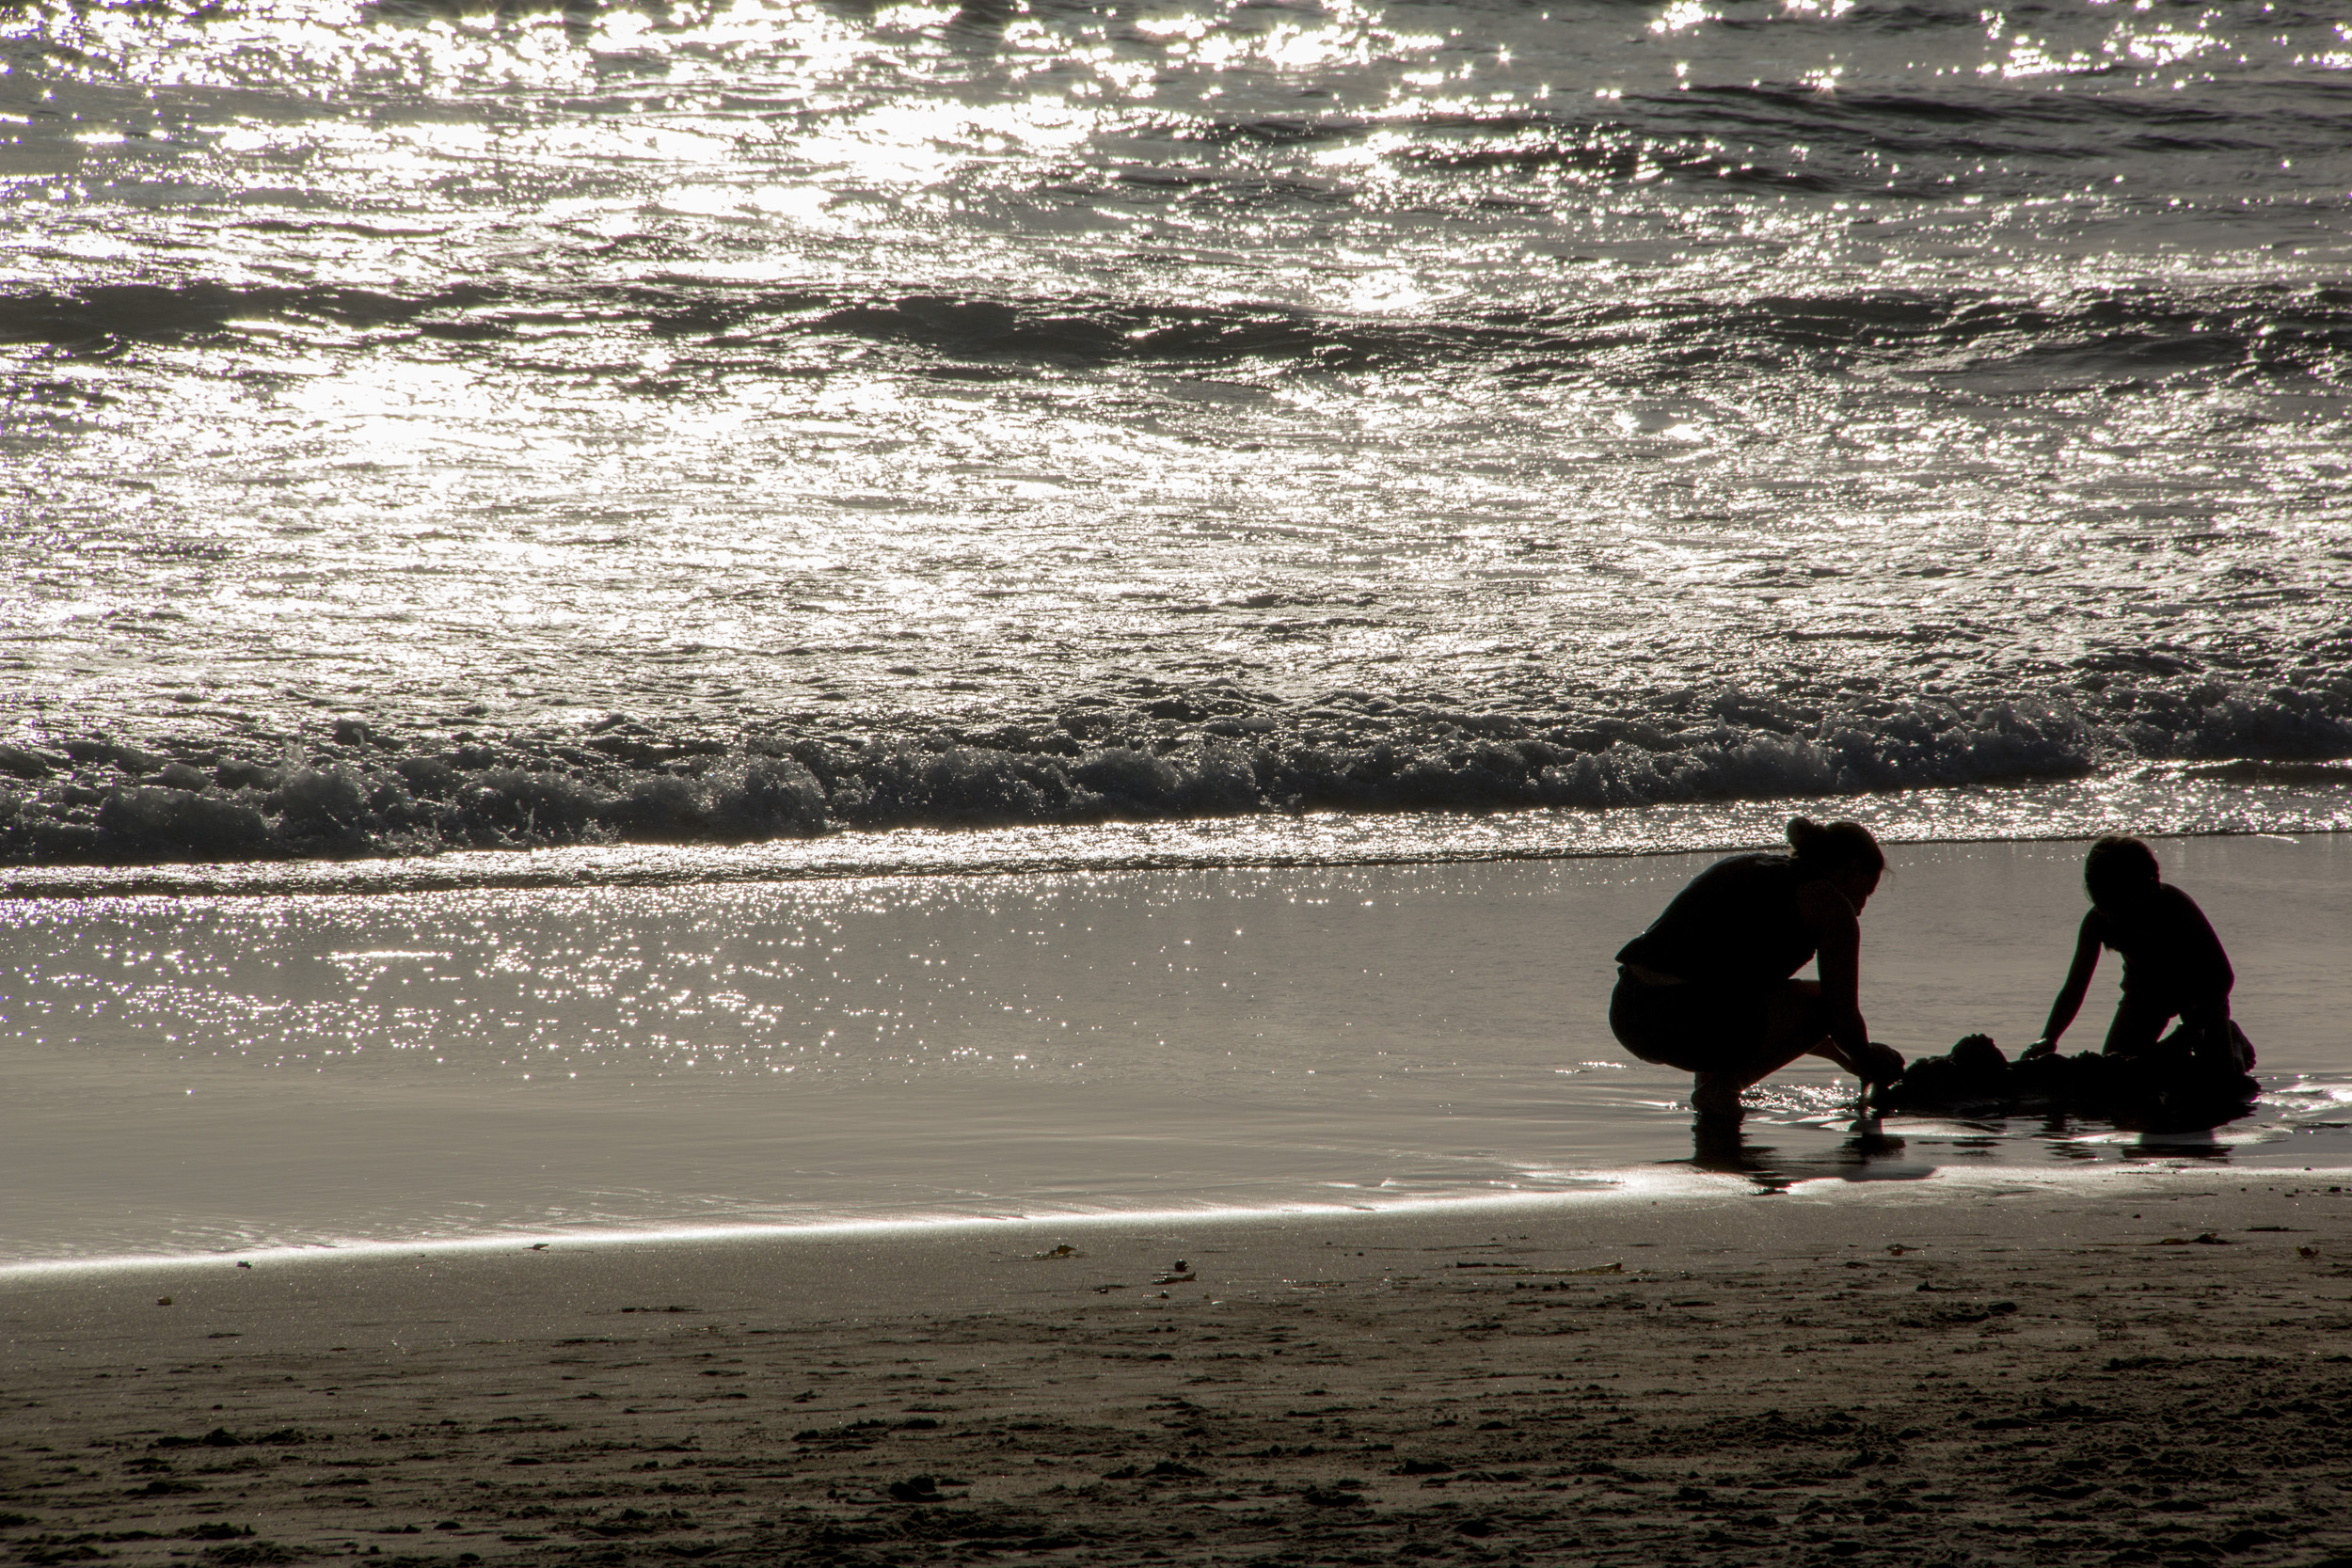 HERMOSA_BEACH_SEP'15_5.jpg